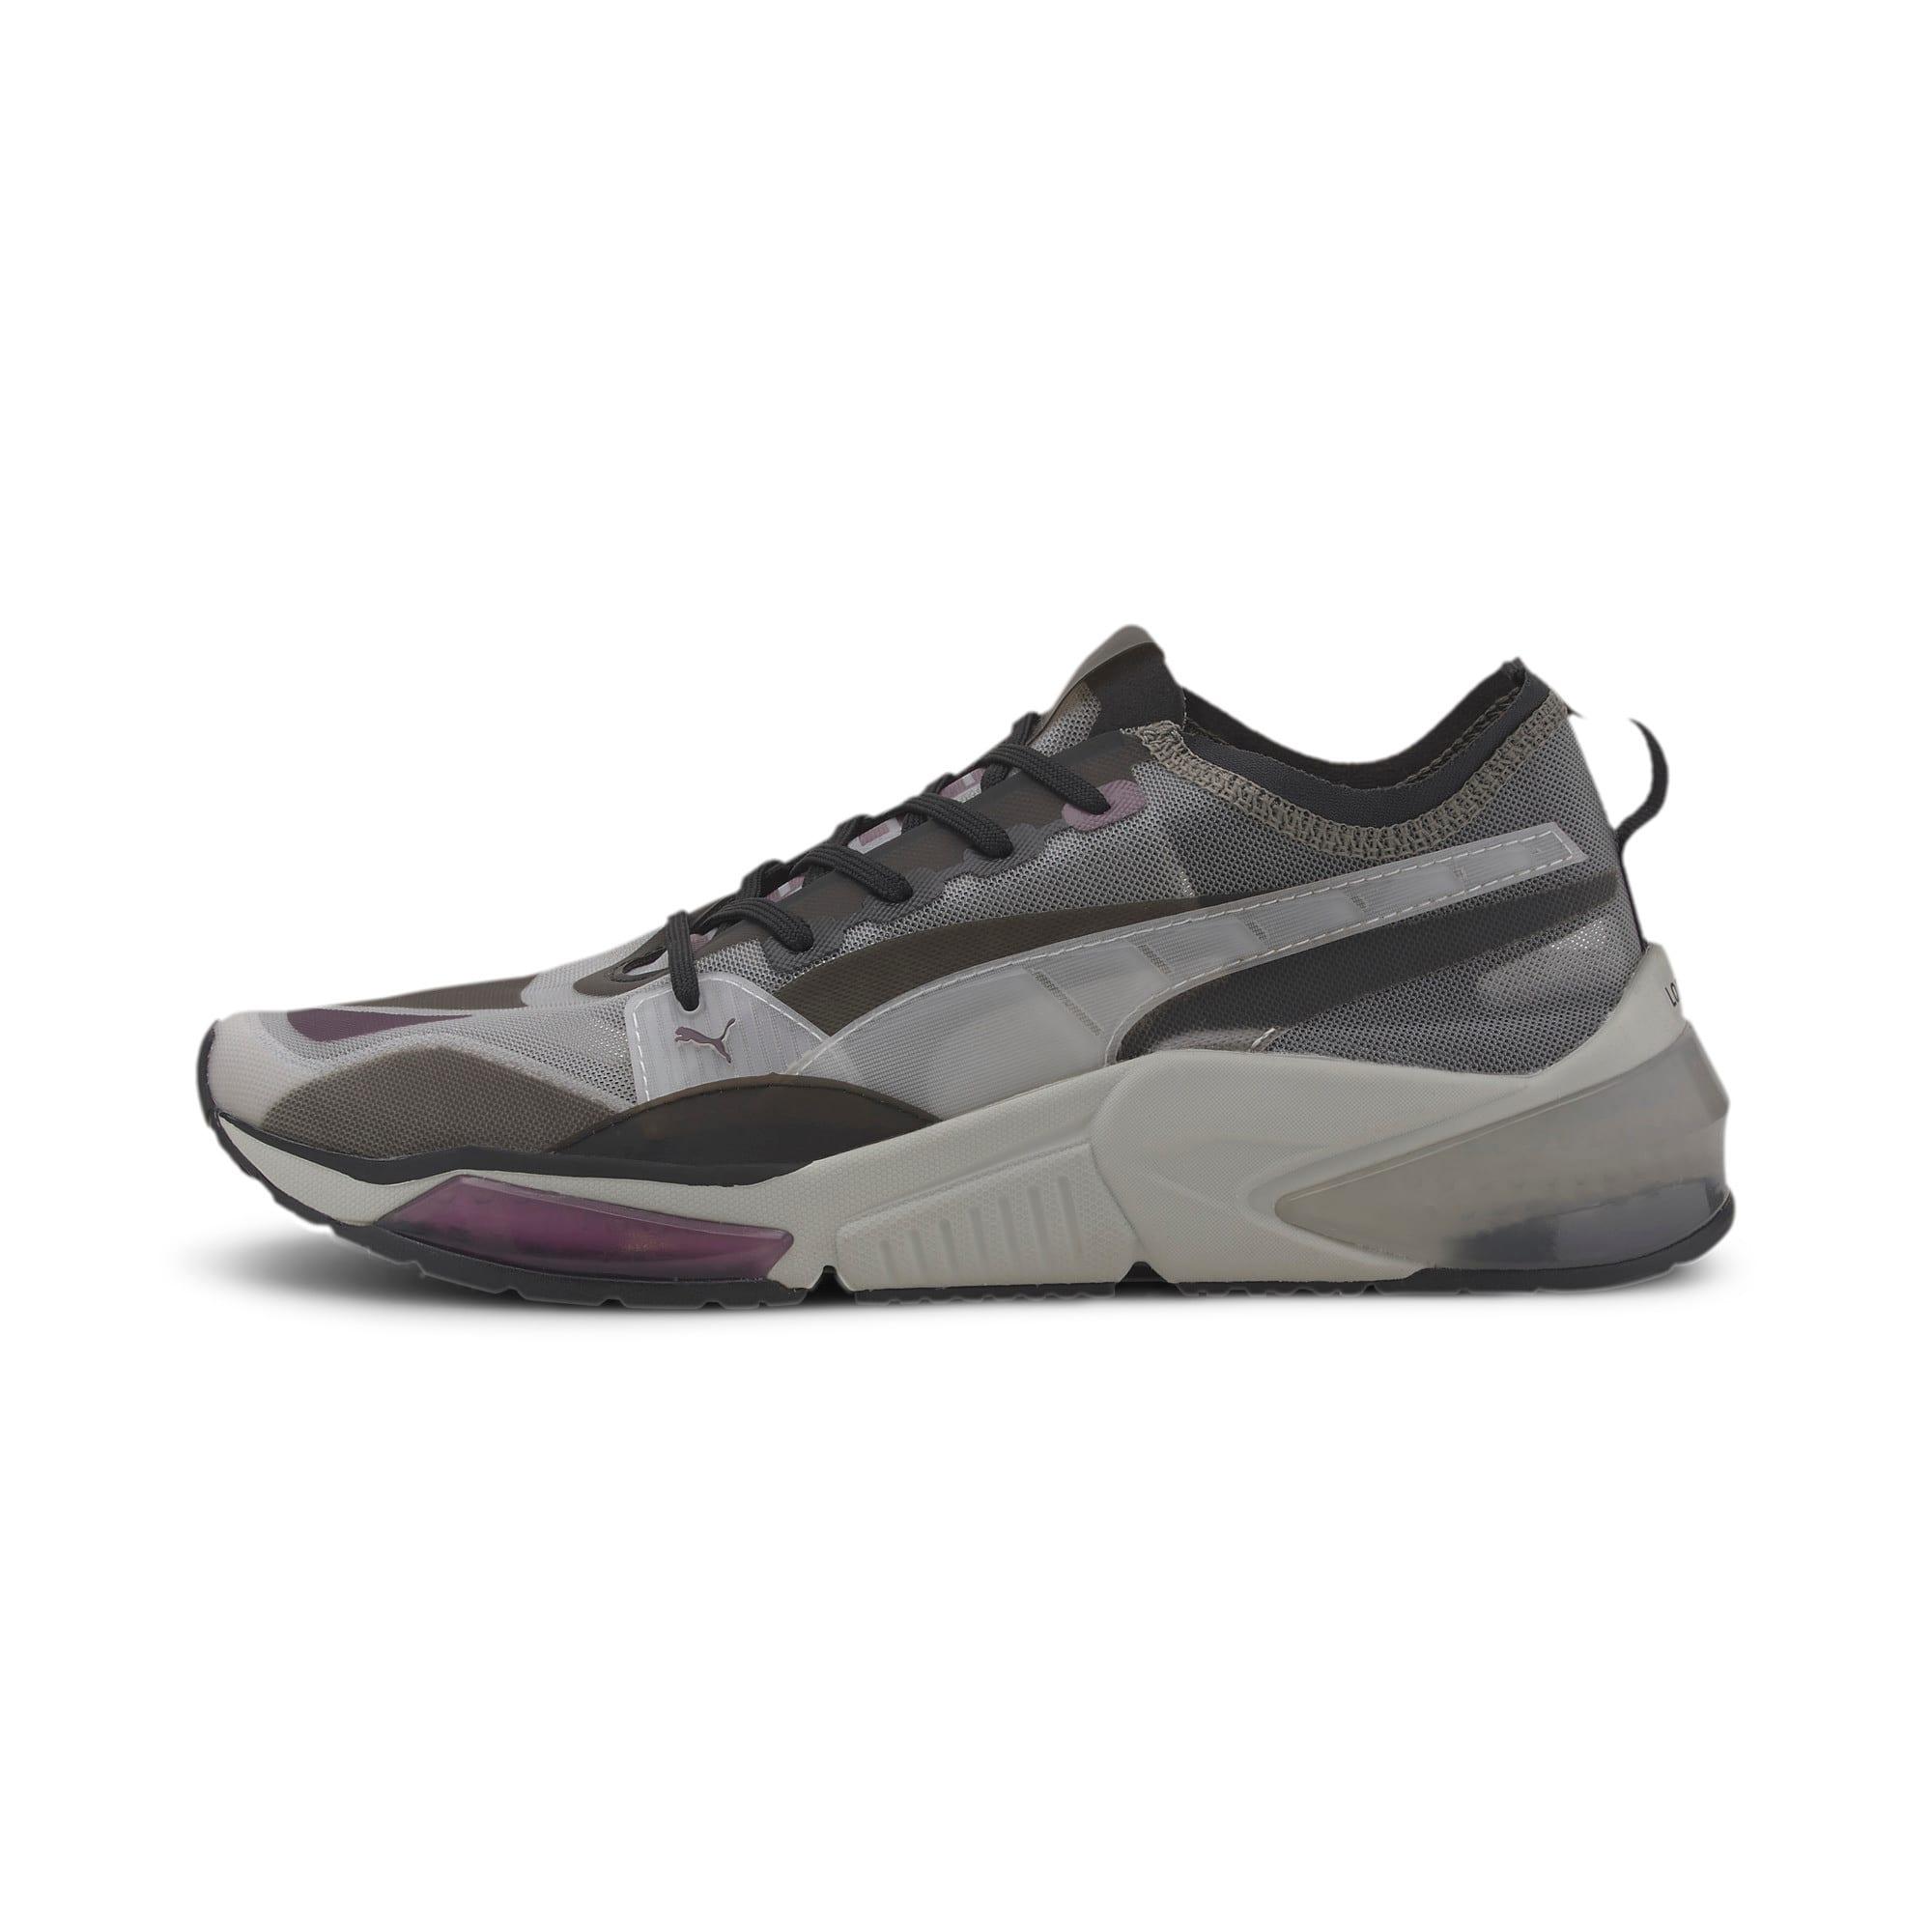 Thumbnail 1 of LQDCELL Optic Sheer Men's Training Shoes, Gray Violet-Puma Black, medium